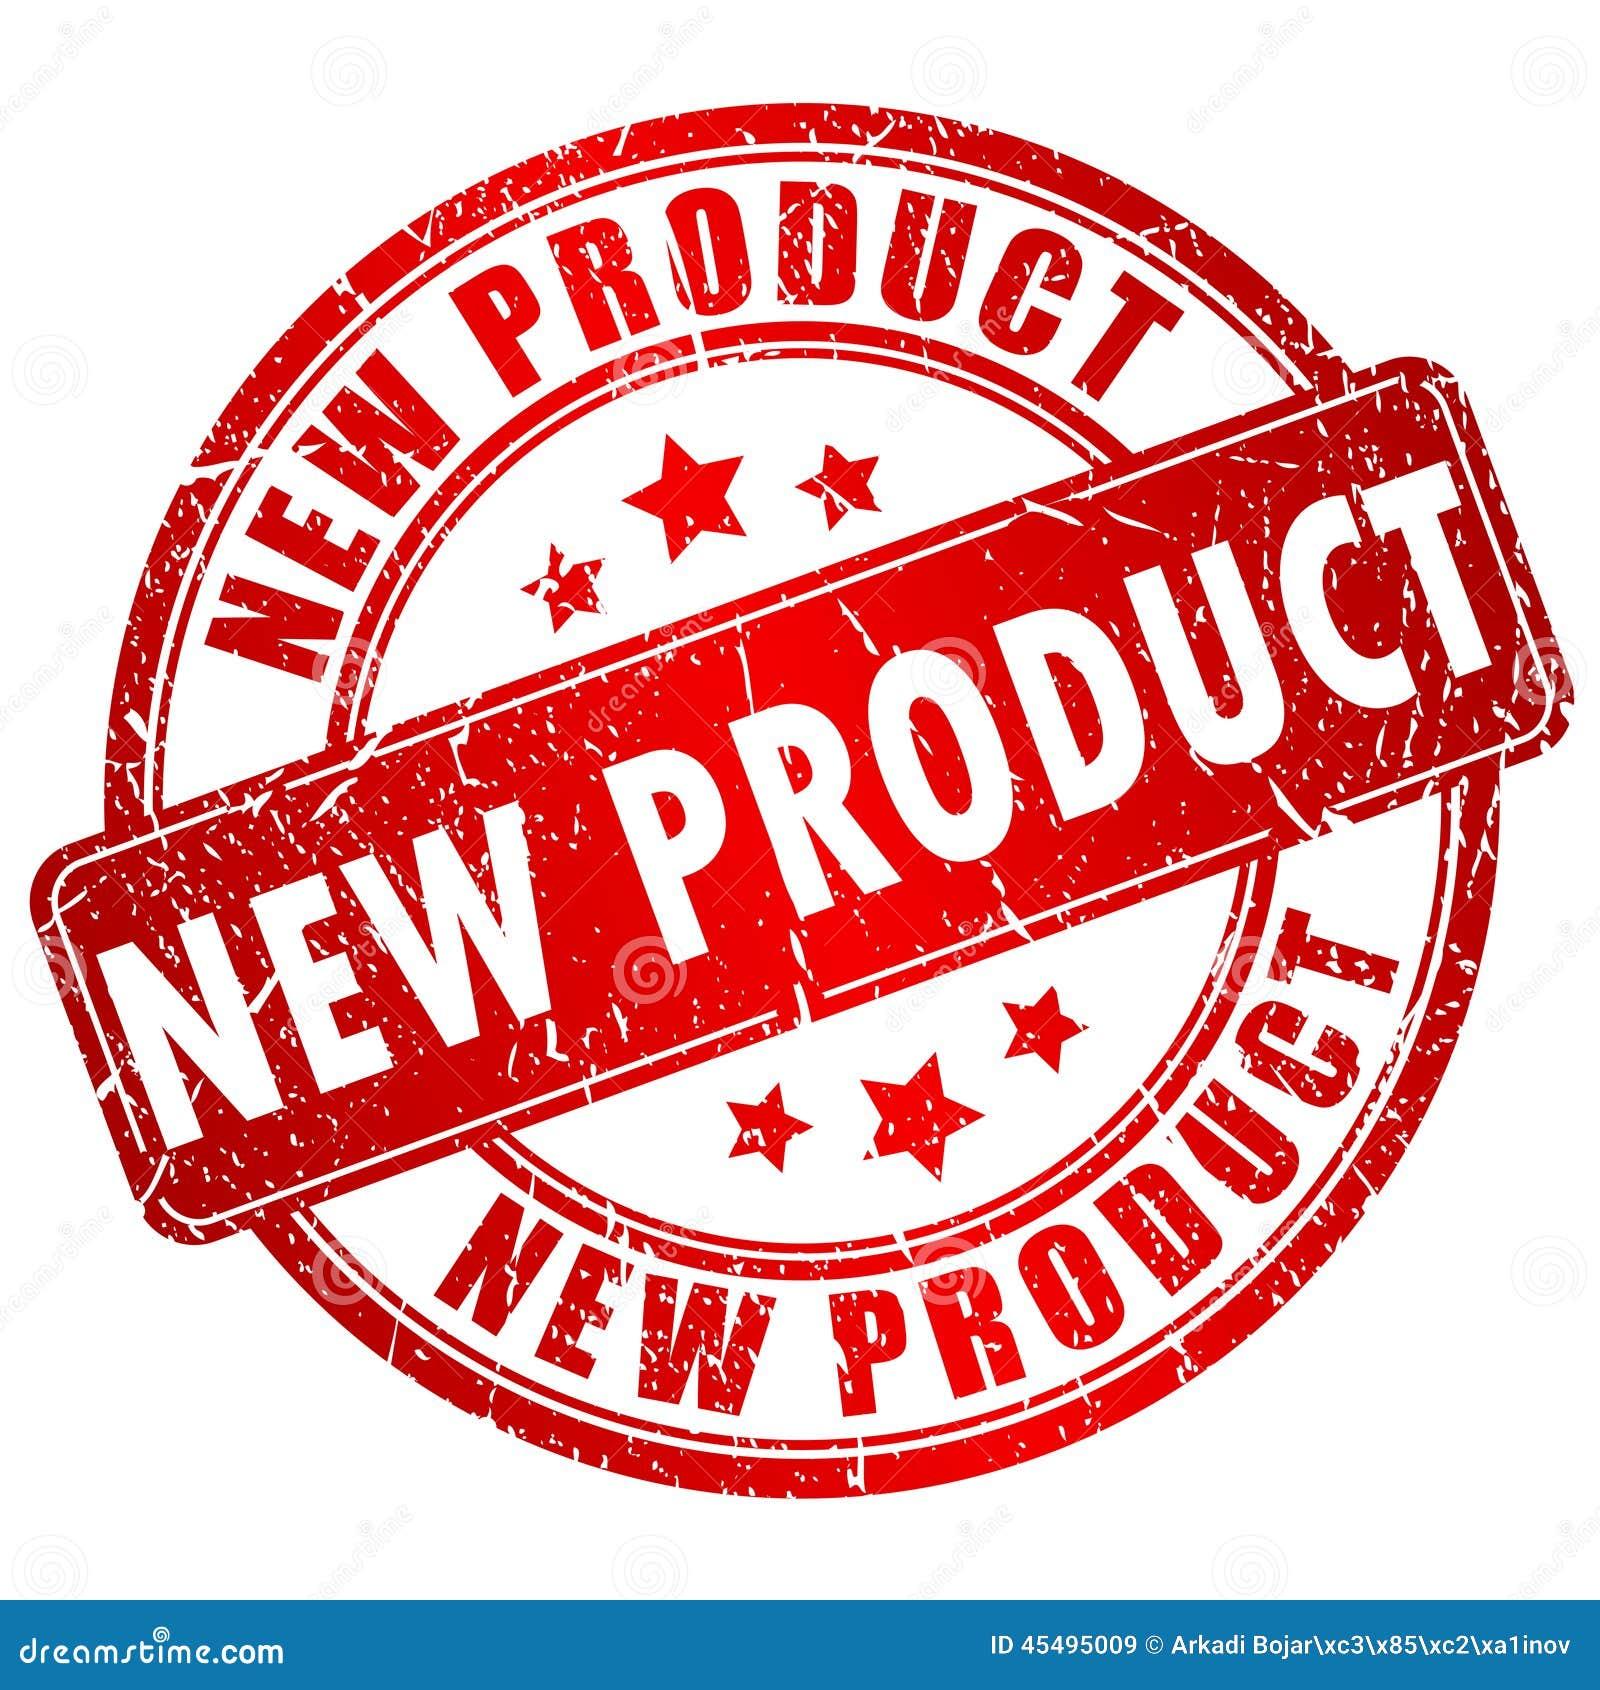 product development (new product development, or NPD)